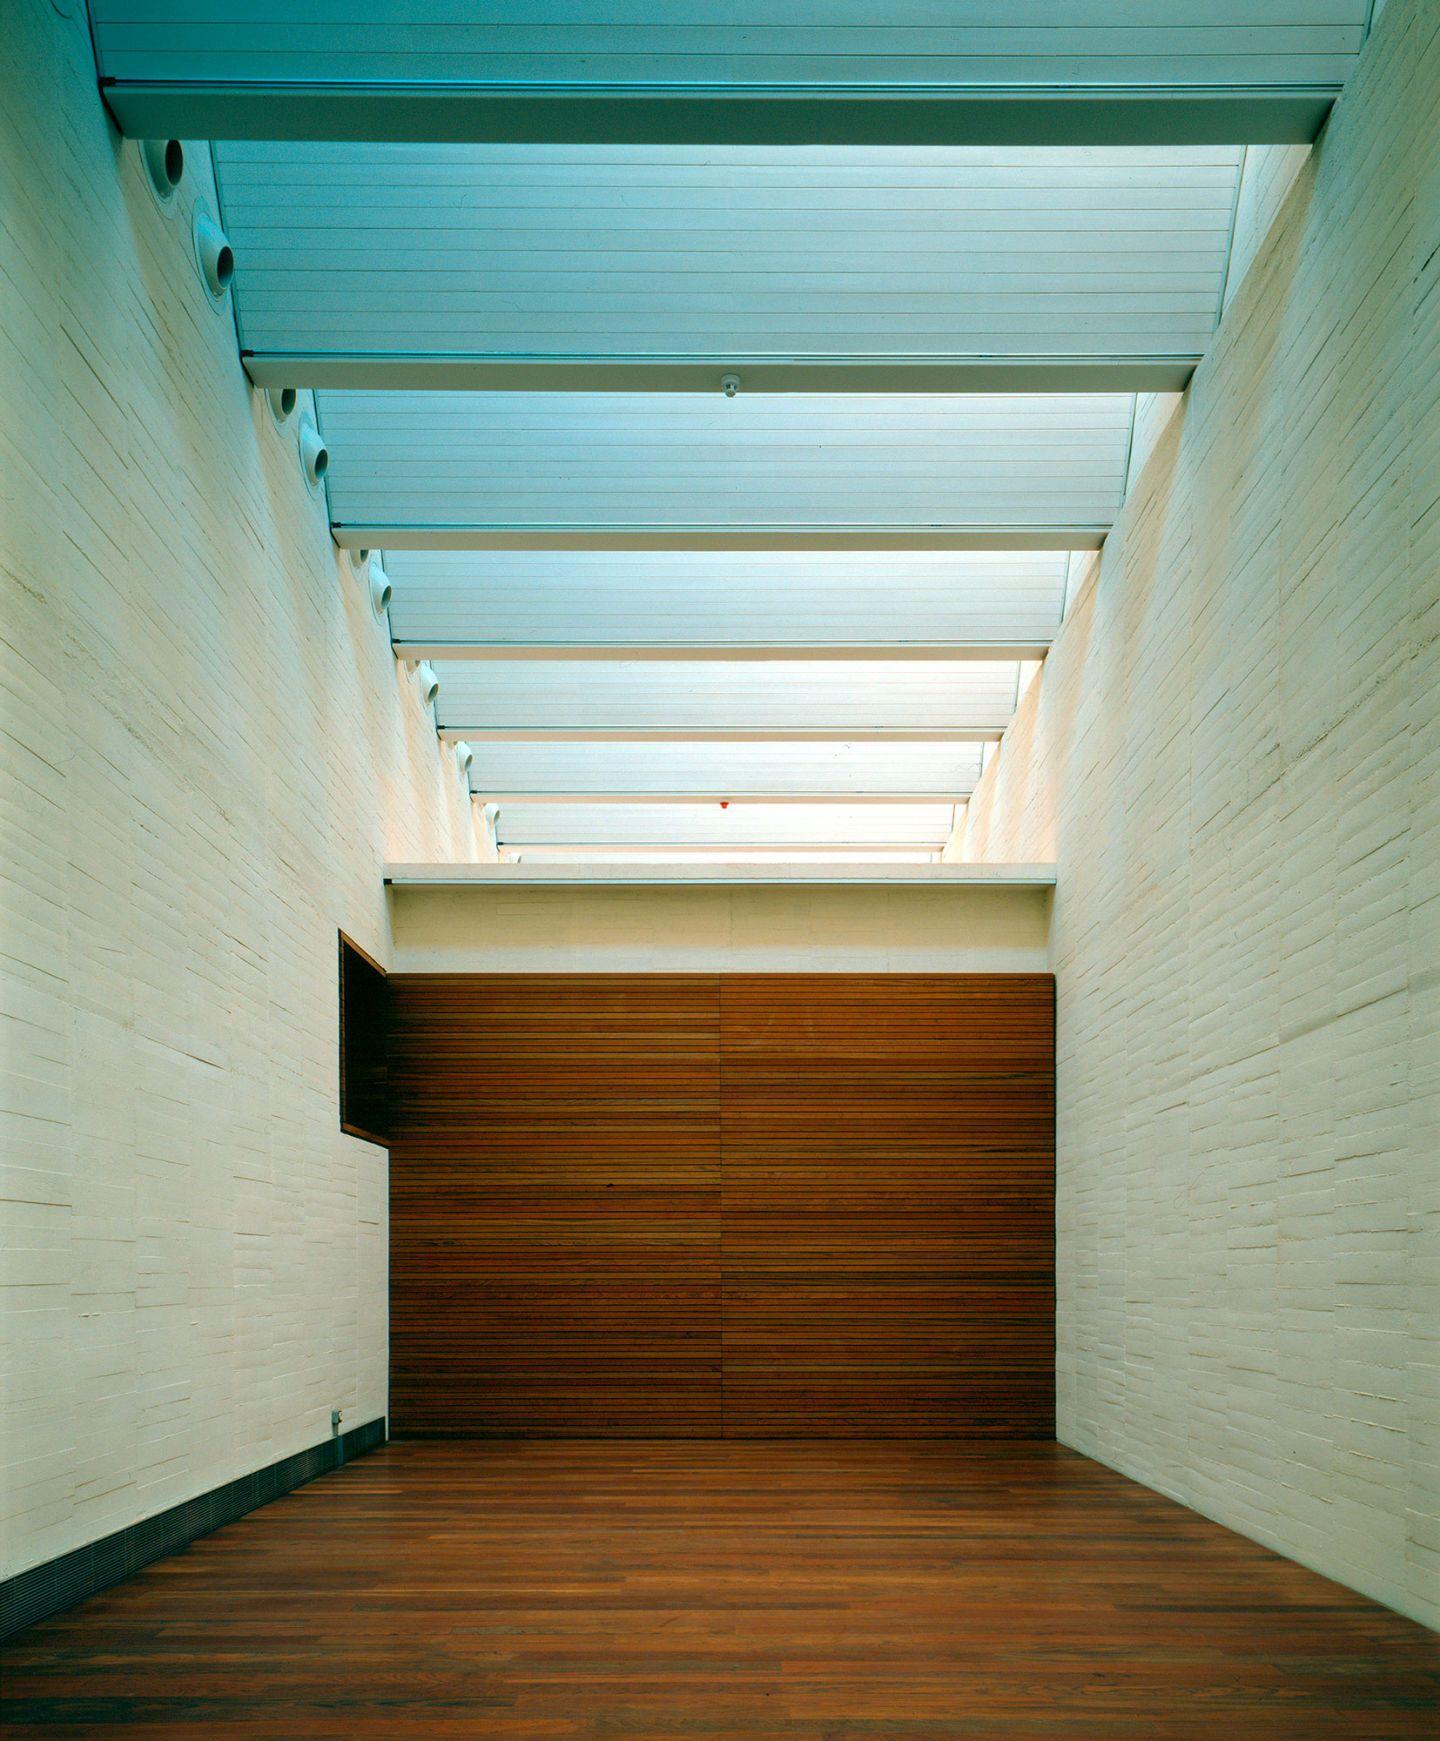 Emilio tu n arquitectos 023 museo de zamora zamora espa a 1992 1996 hospital - Arquitectos en zamora ...